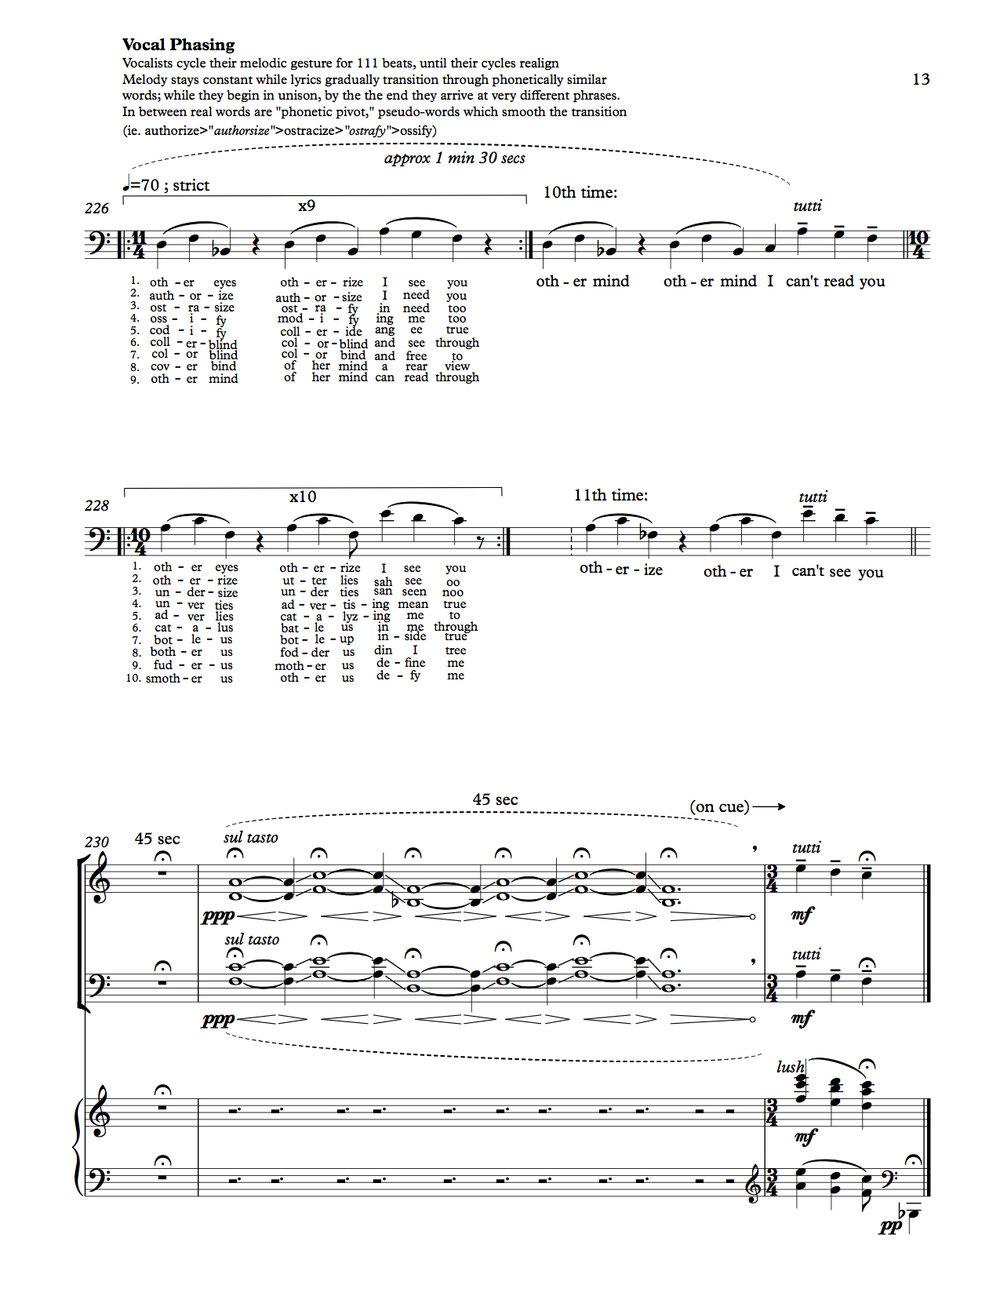 Other Ize 6 - Full Score (dragged).jpg